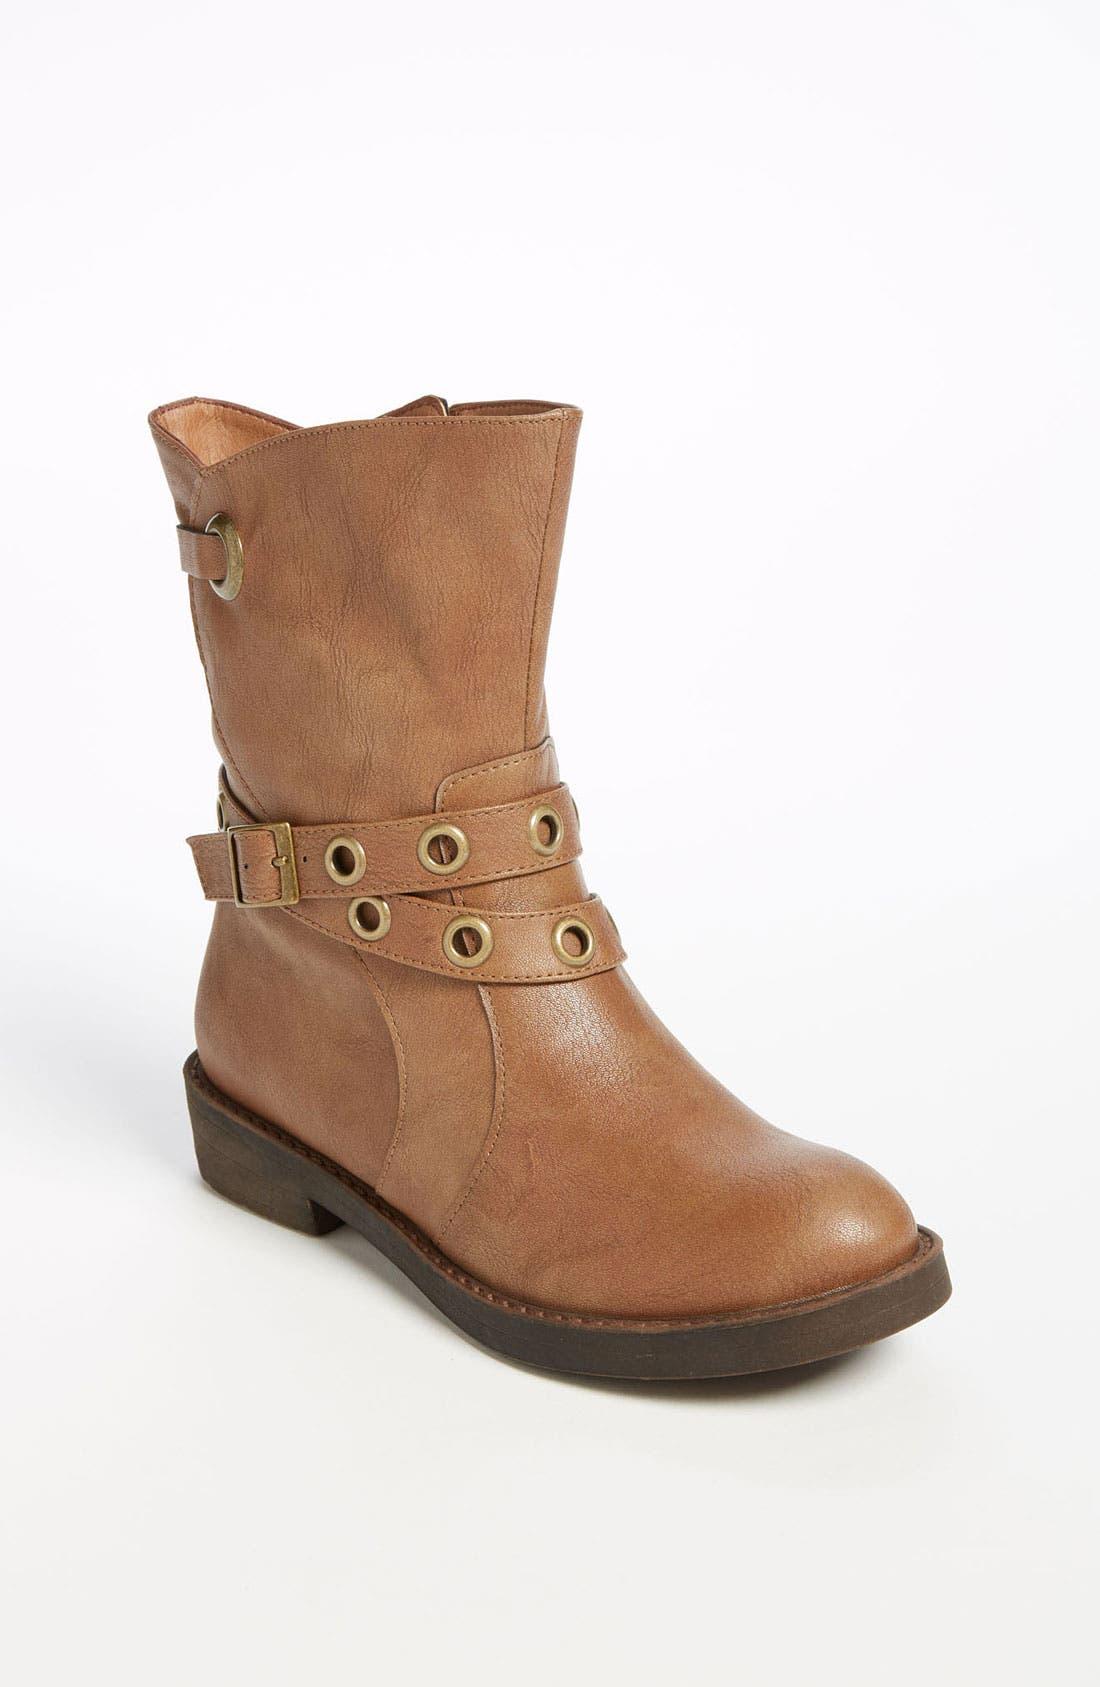 Alternate Image 1 Selected - Jessica Simpson 'Ellice' Boot (Little Kid & Big Kid) (Online Only)